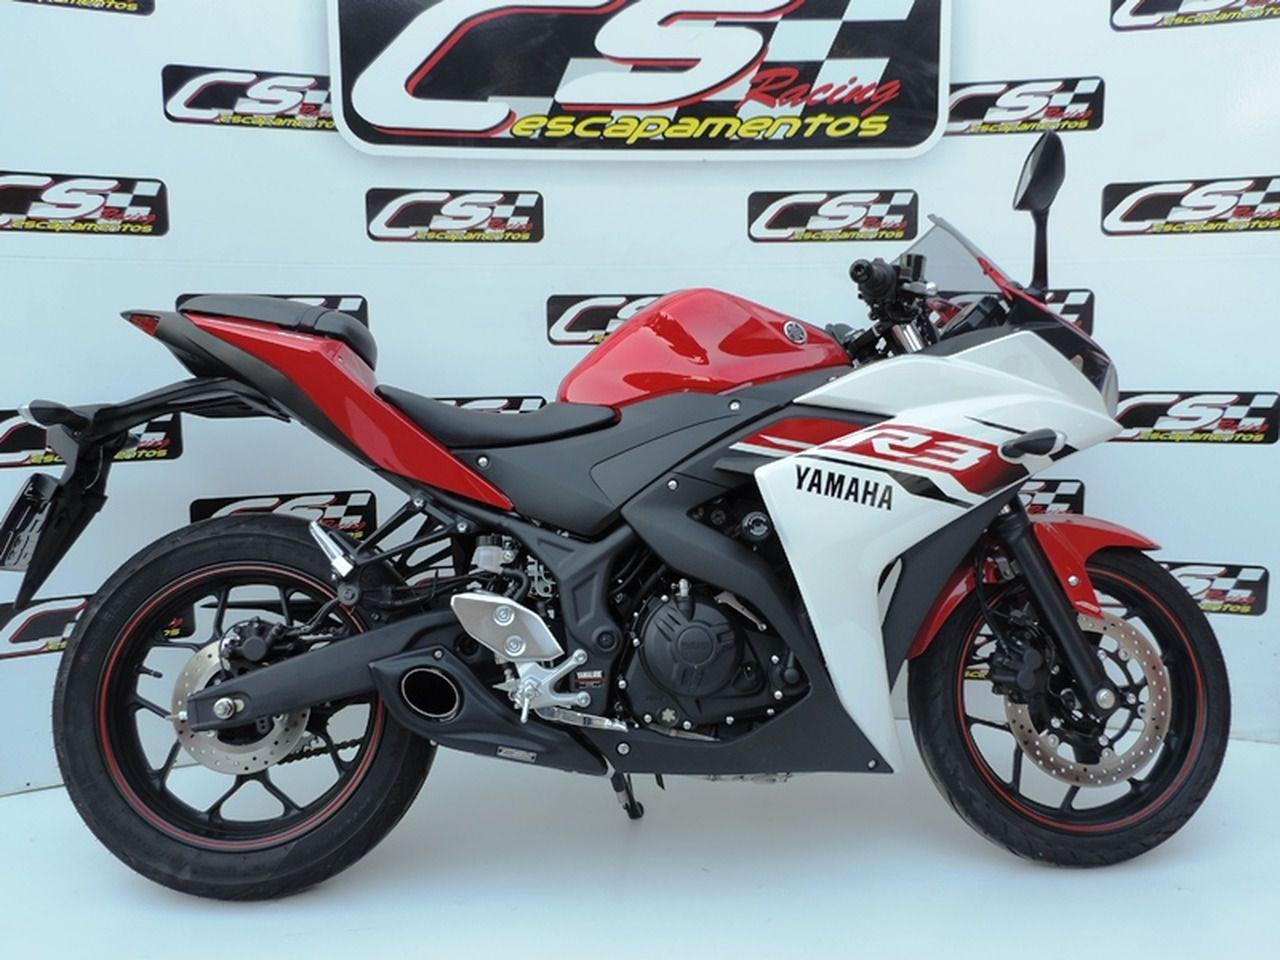 Escapamento Esportivo Full   CS Racing   Yamaha R3